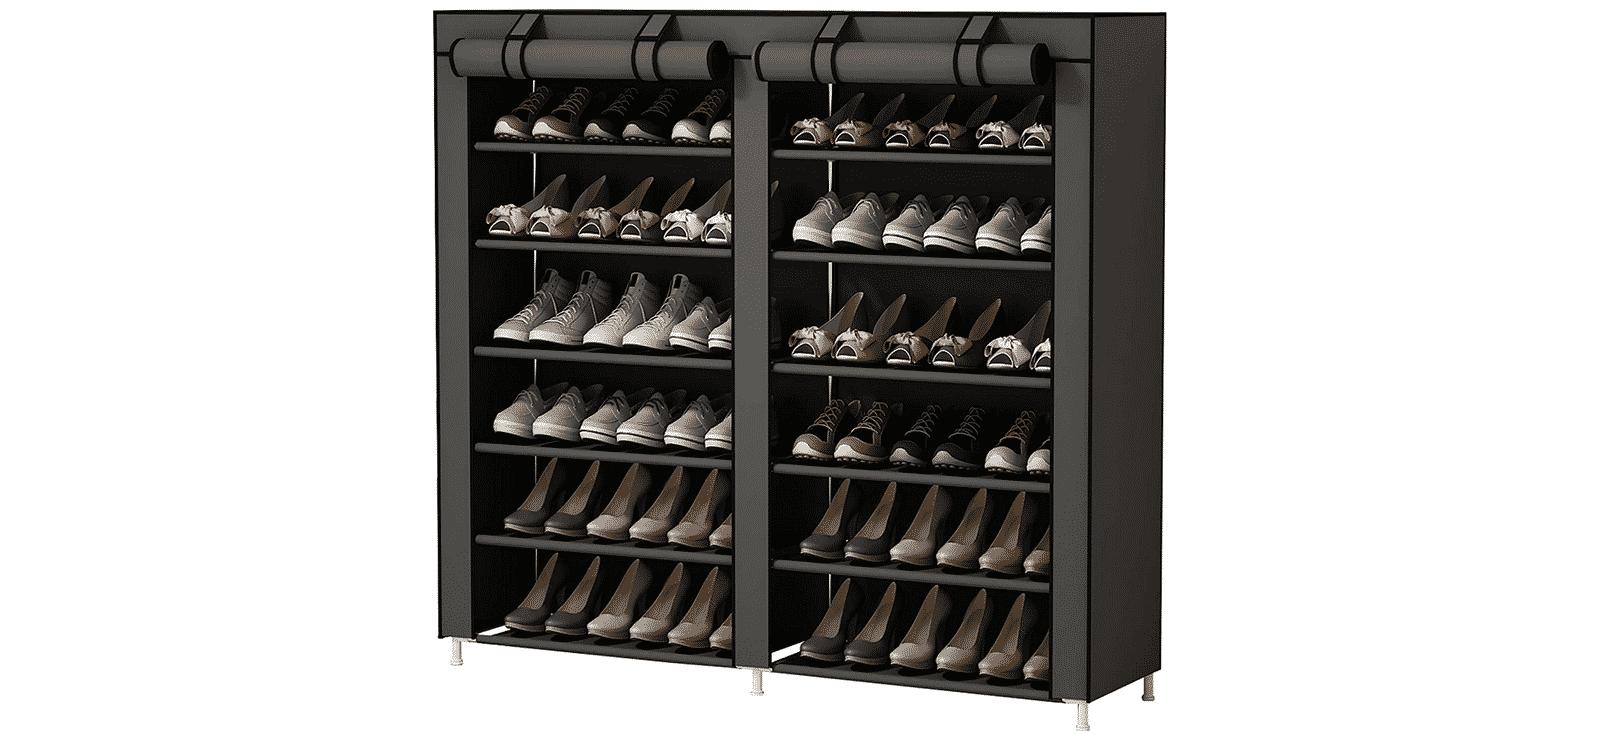 Meilleur meuble à chaussures